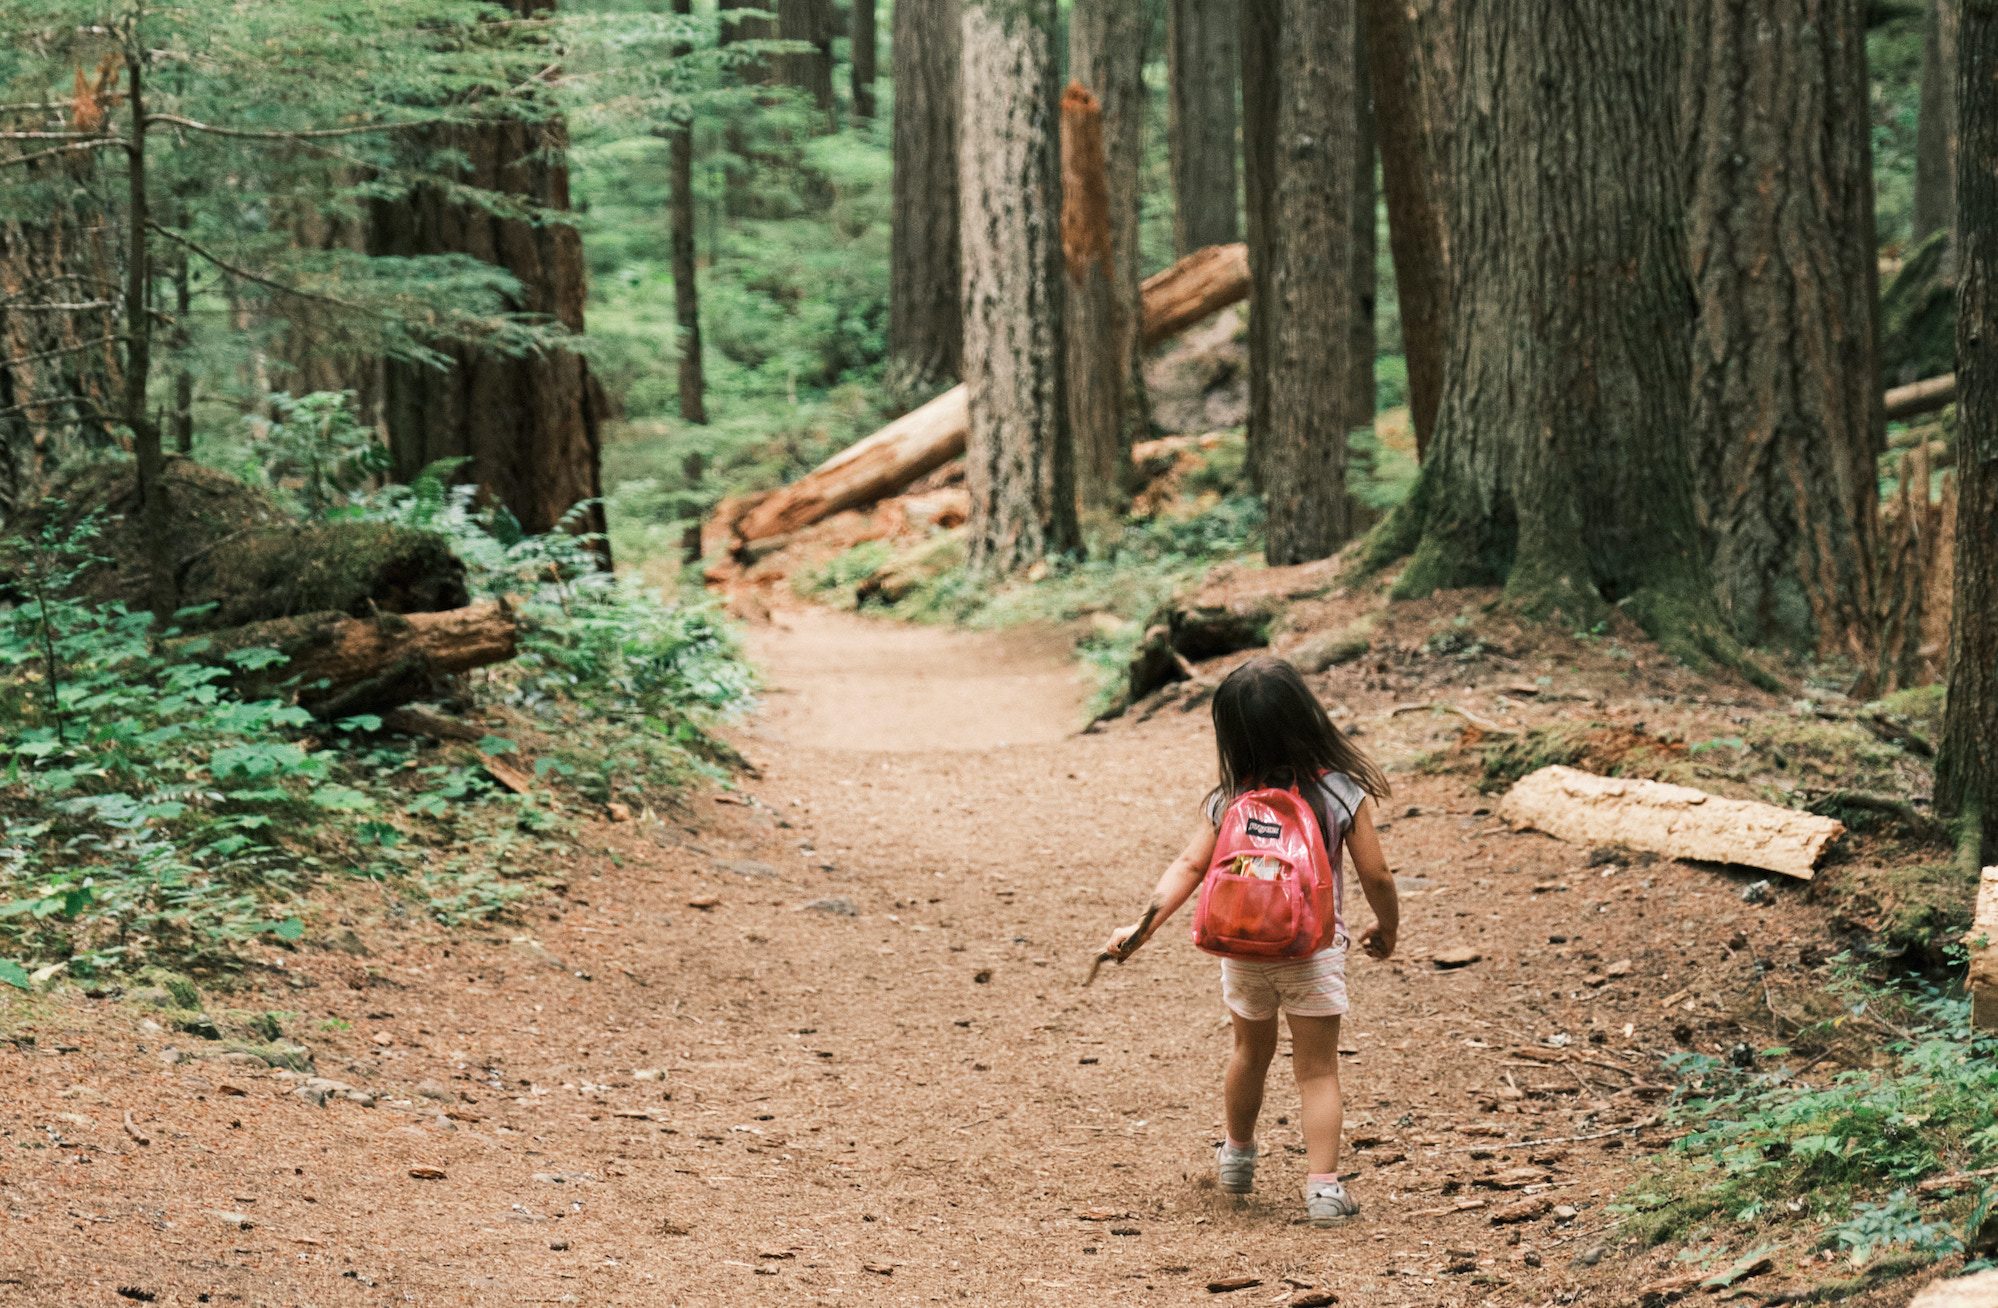 A little girl wearing a pink backpack walking along a trail